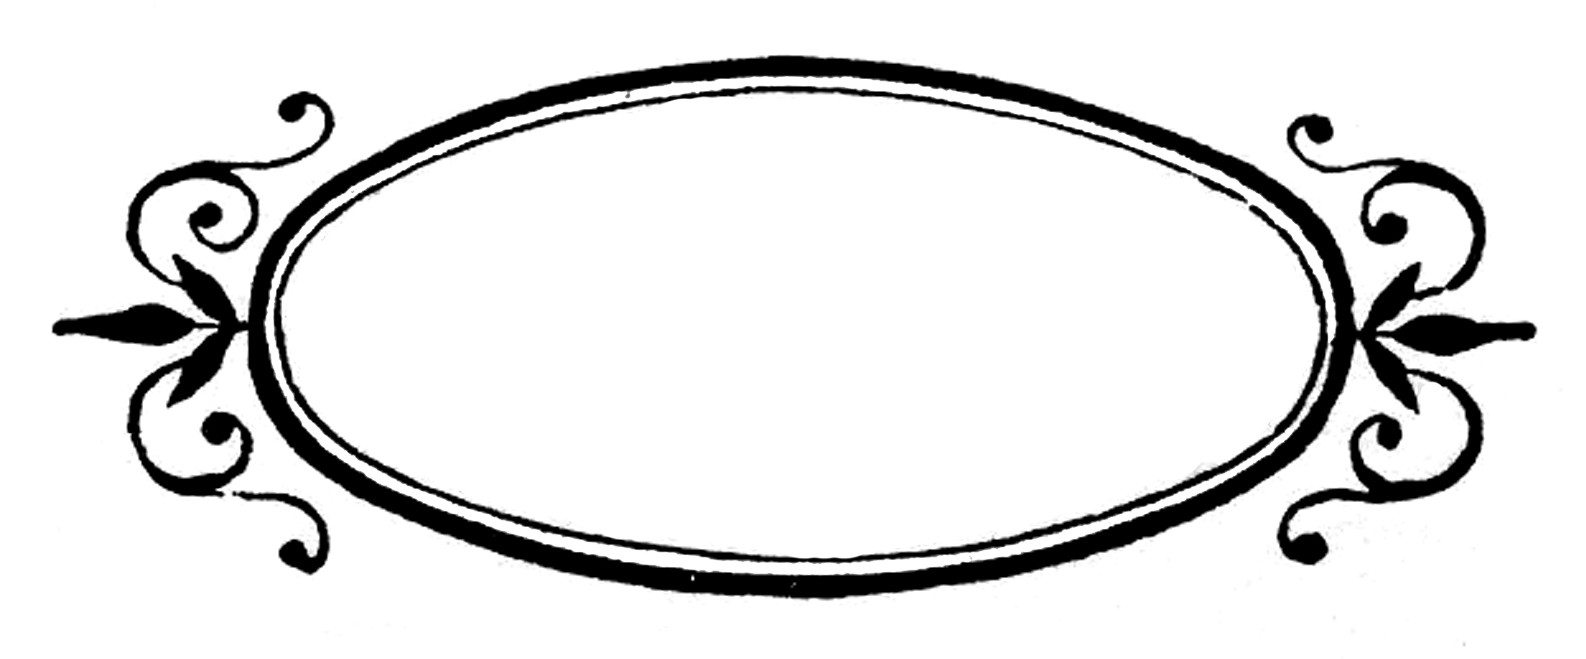 Vintage Oval Border Clip Art